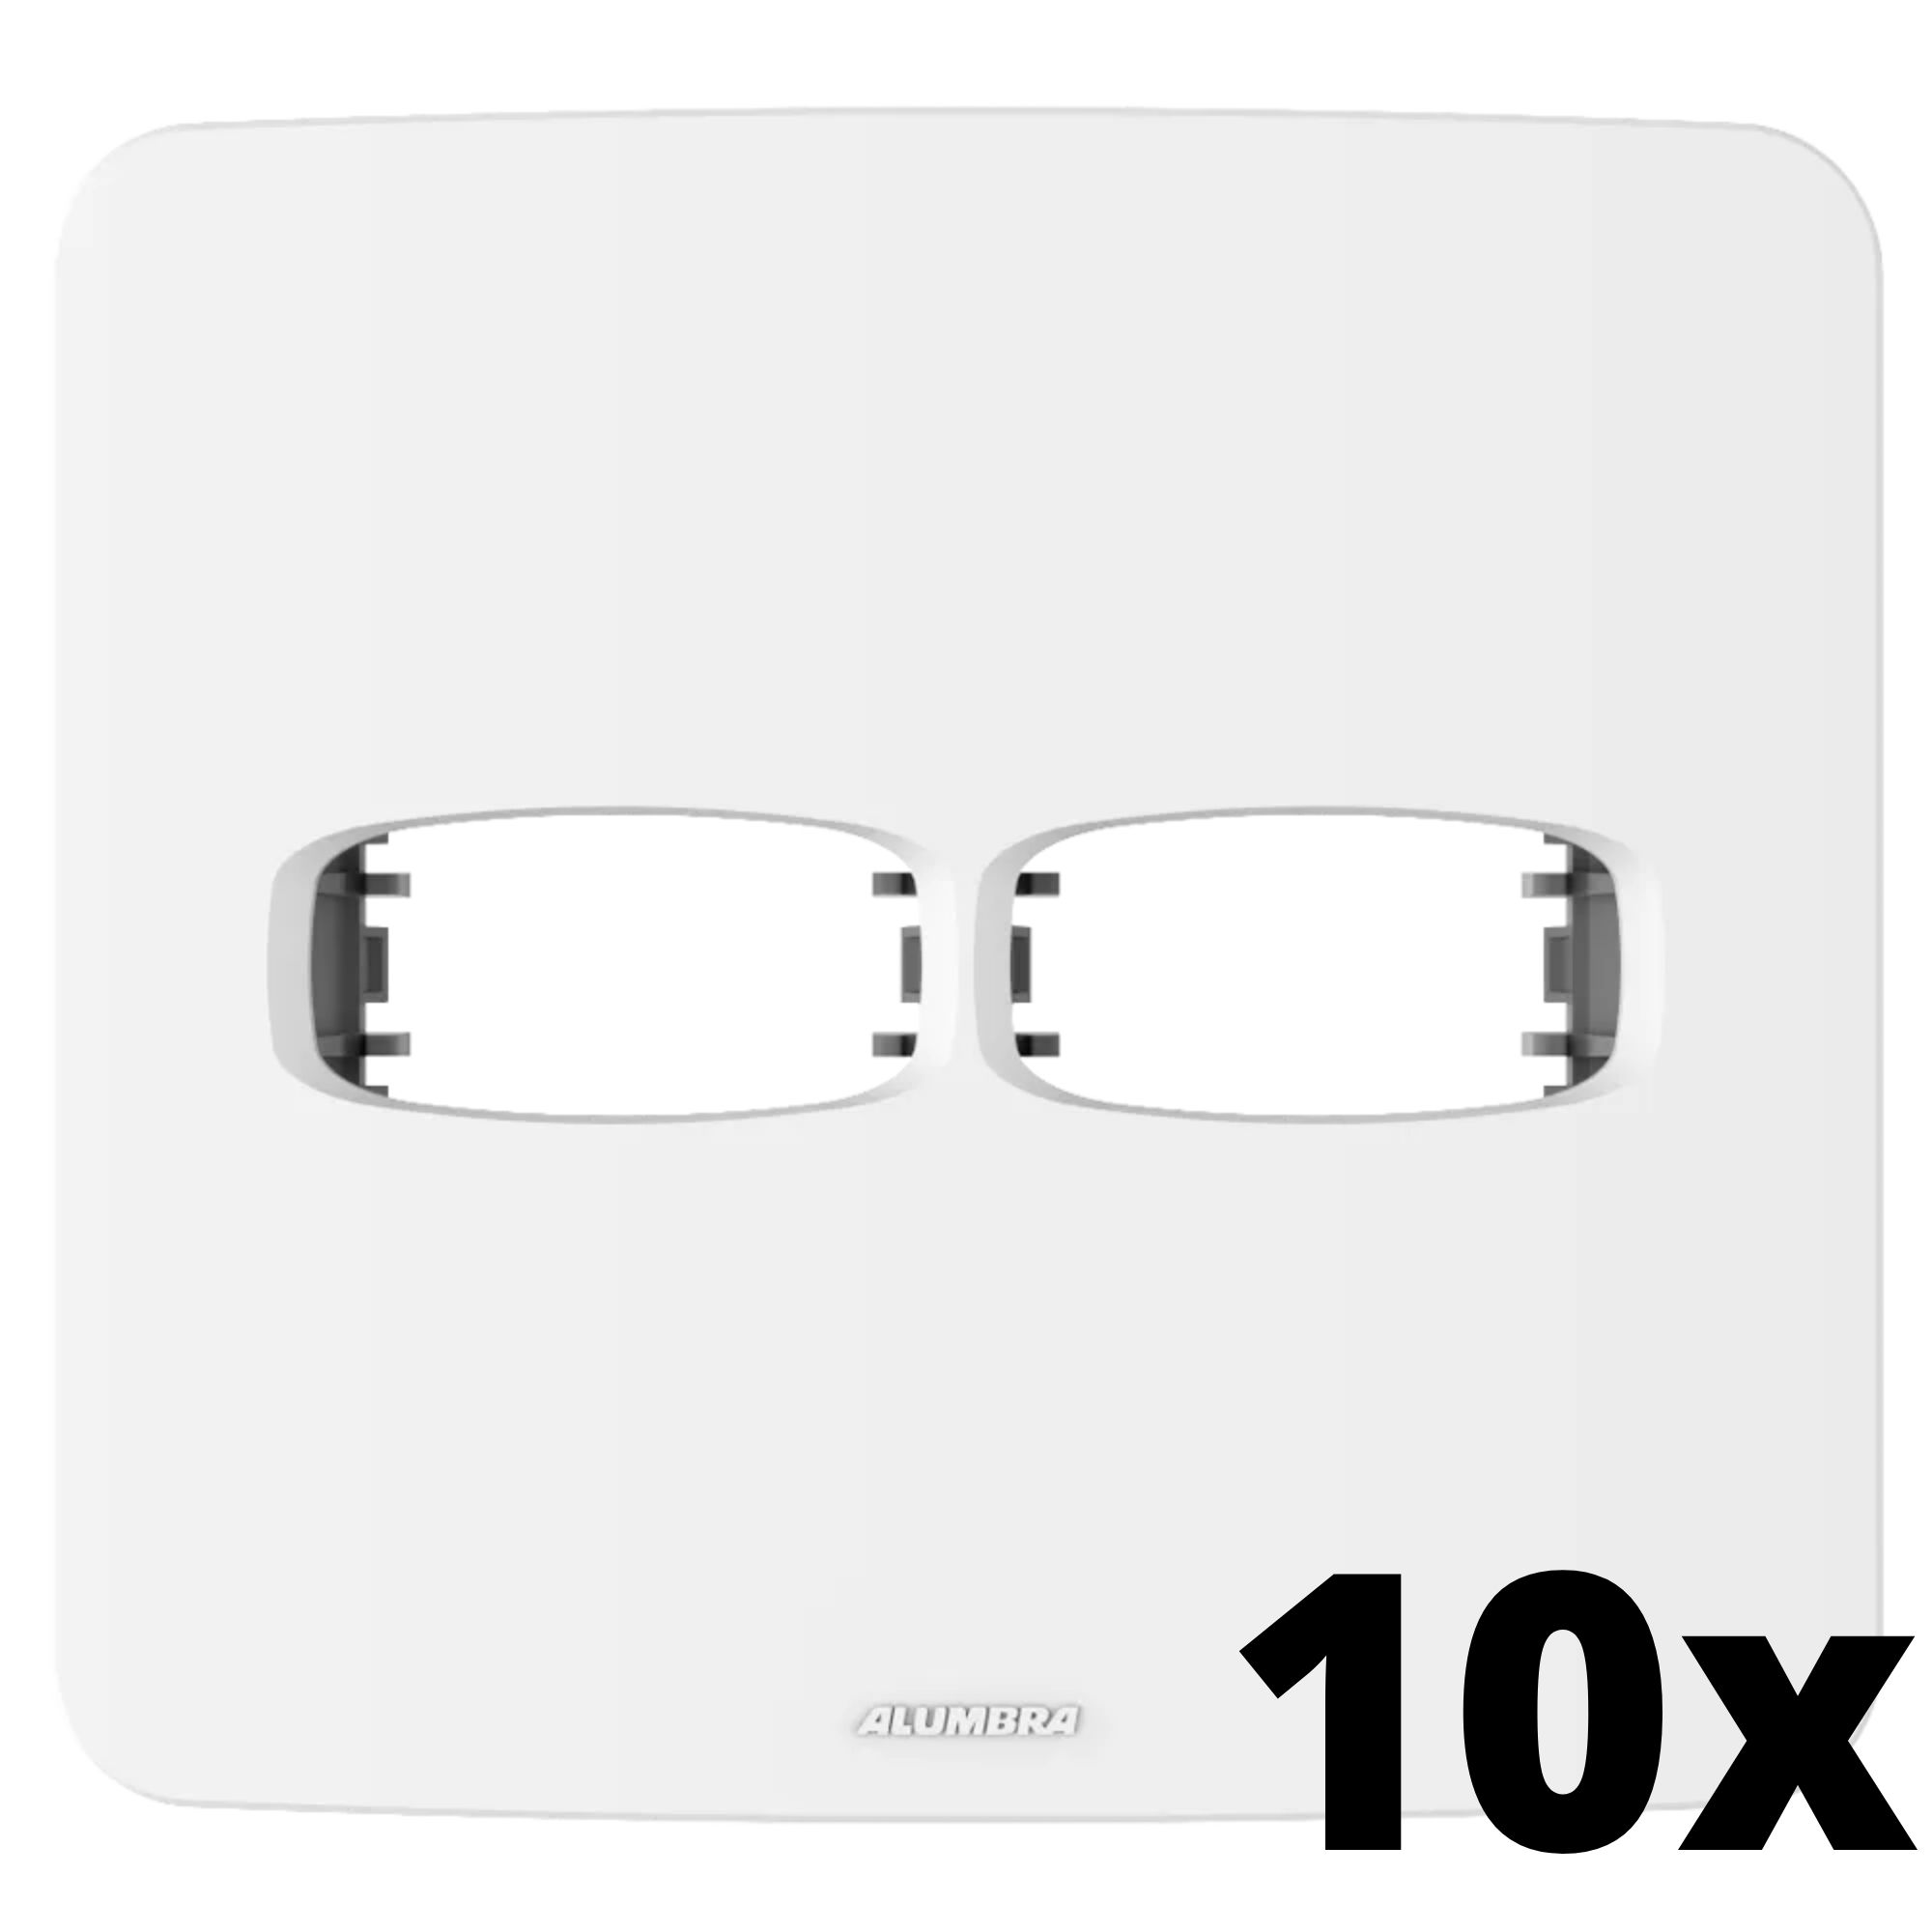 Kit 10 und Gracia Placa 4x4 1 Seção + 1 Seção